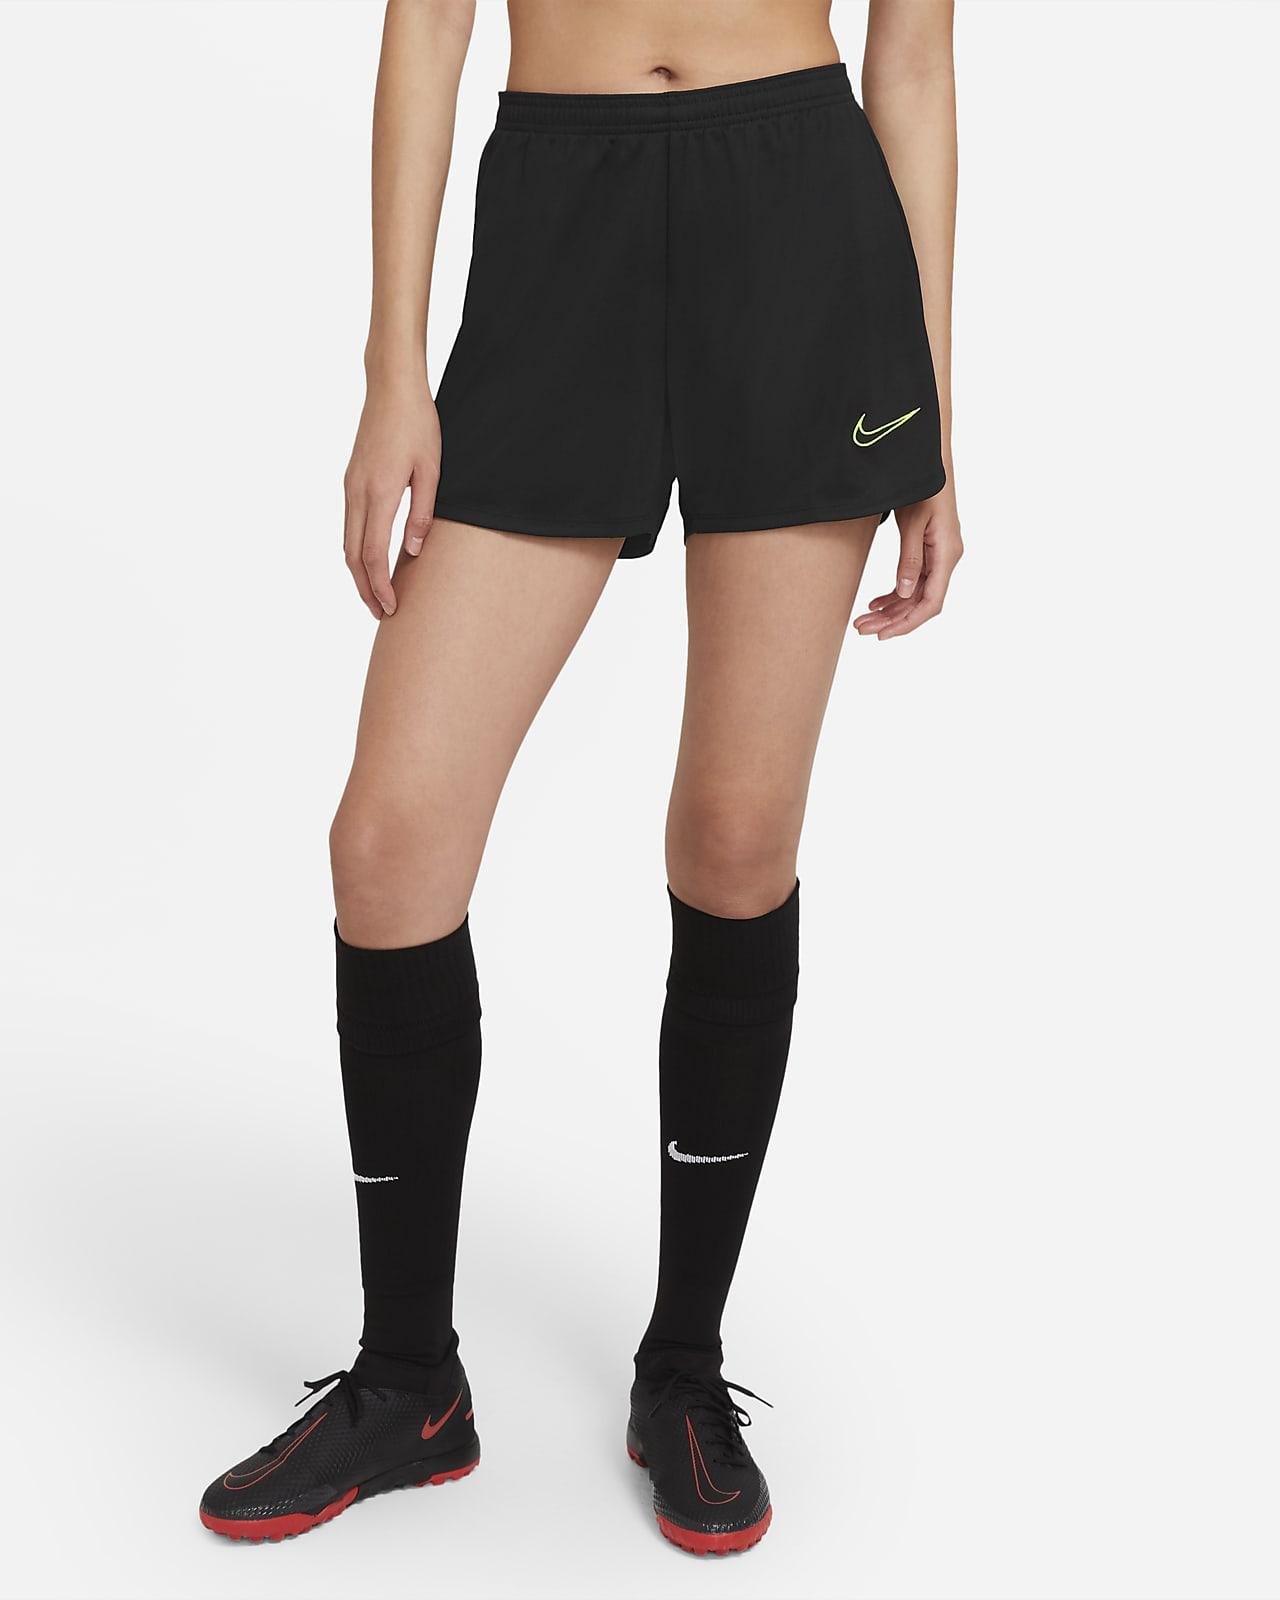 Shorts de fútbol tejidos para mujer Nike Dri-FIT Academy